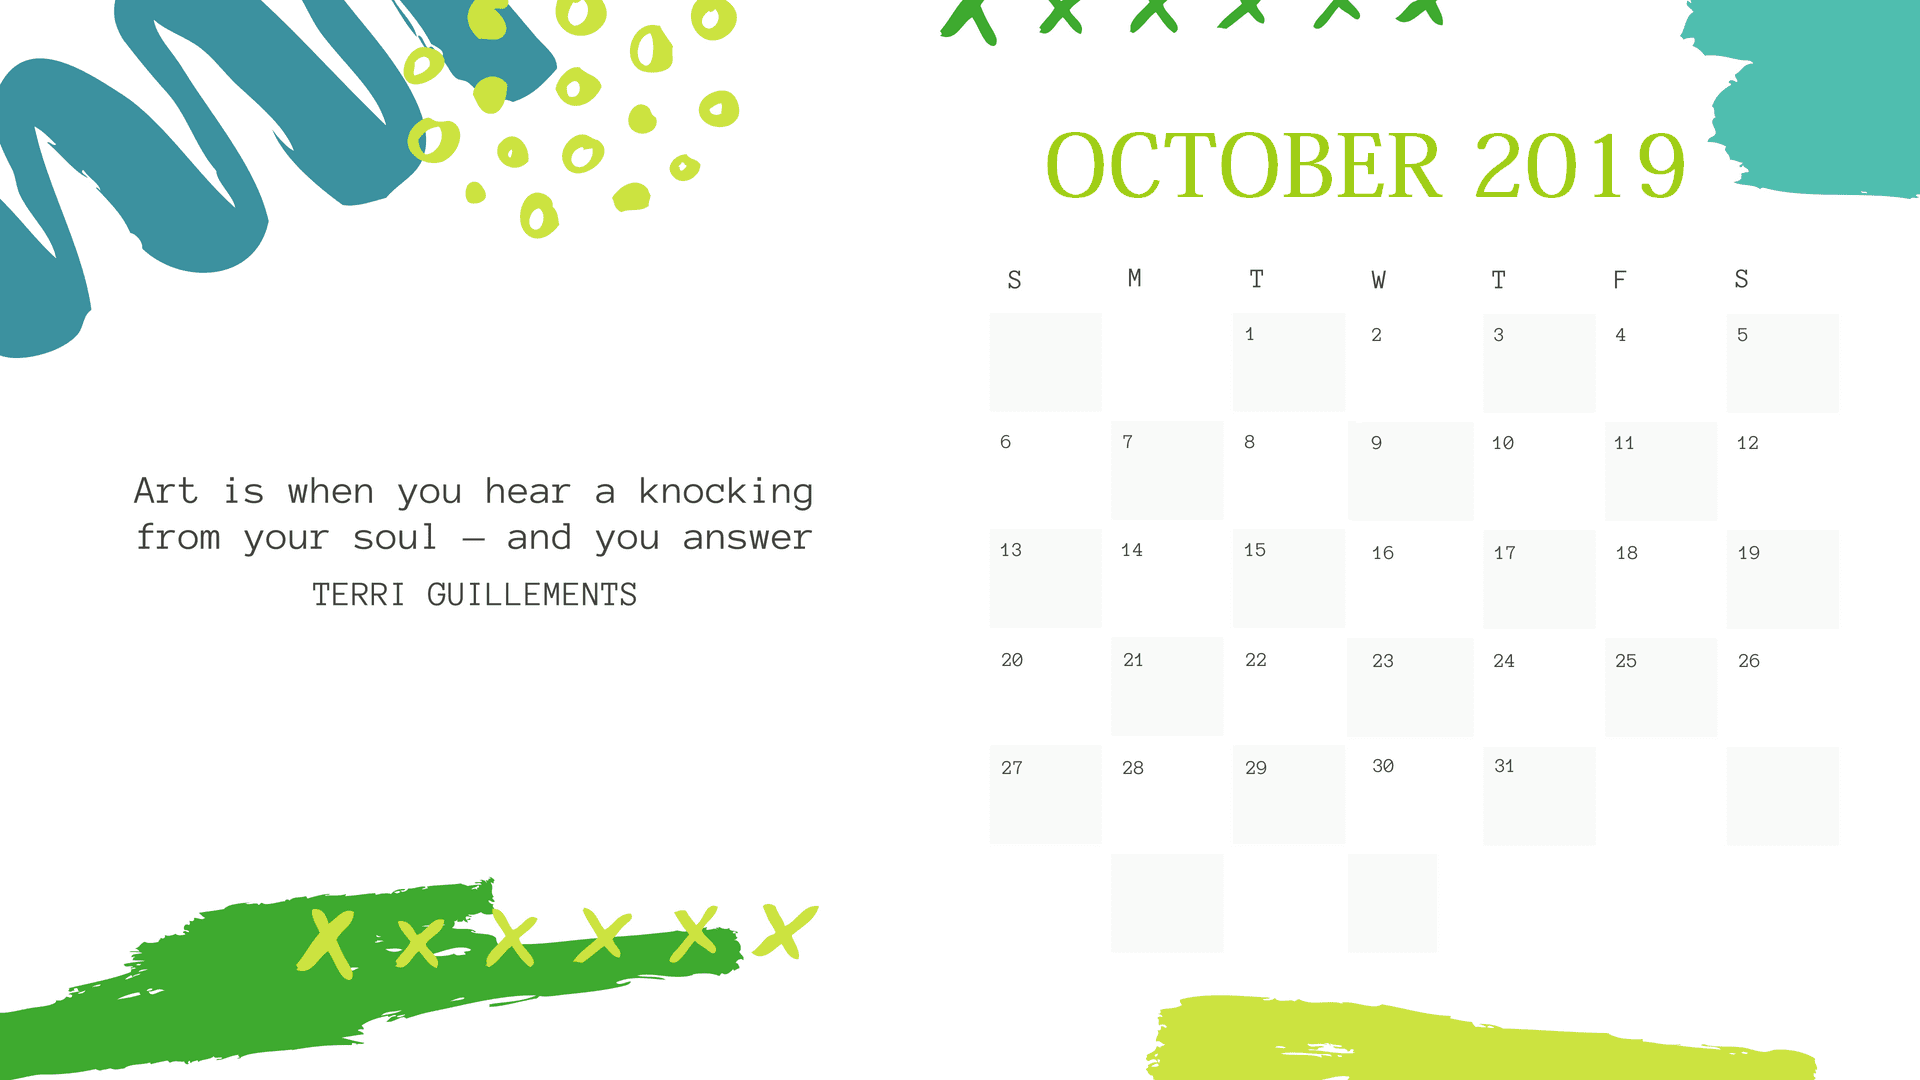 Free Cute October 2019 Quotes Calendar